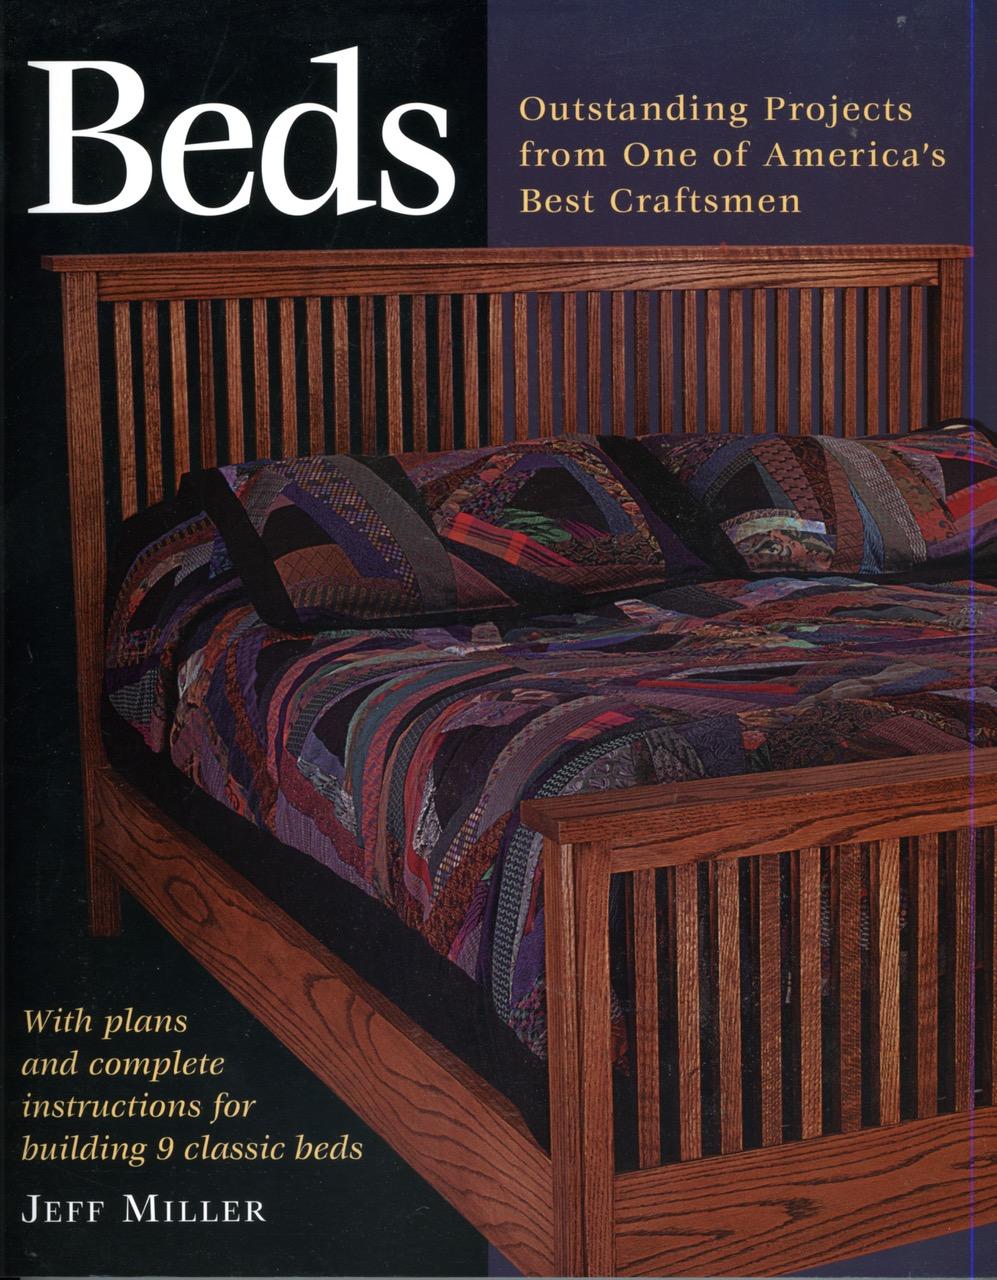 BedsCover.jpeg